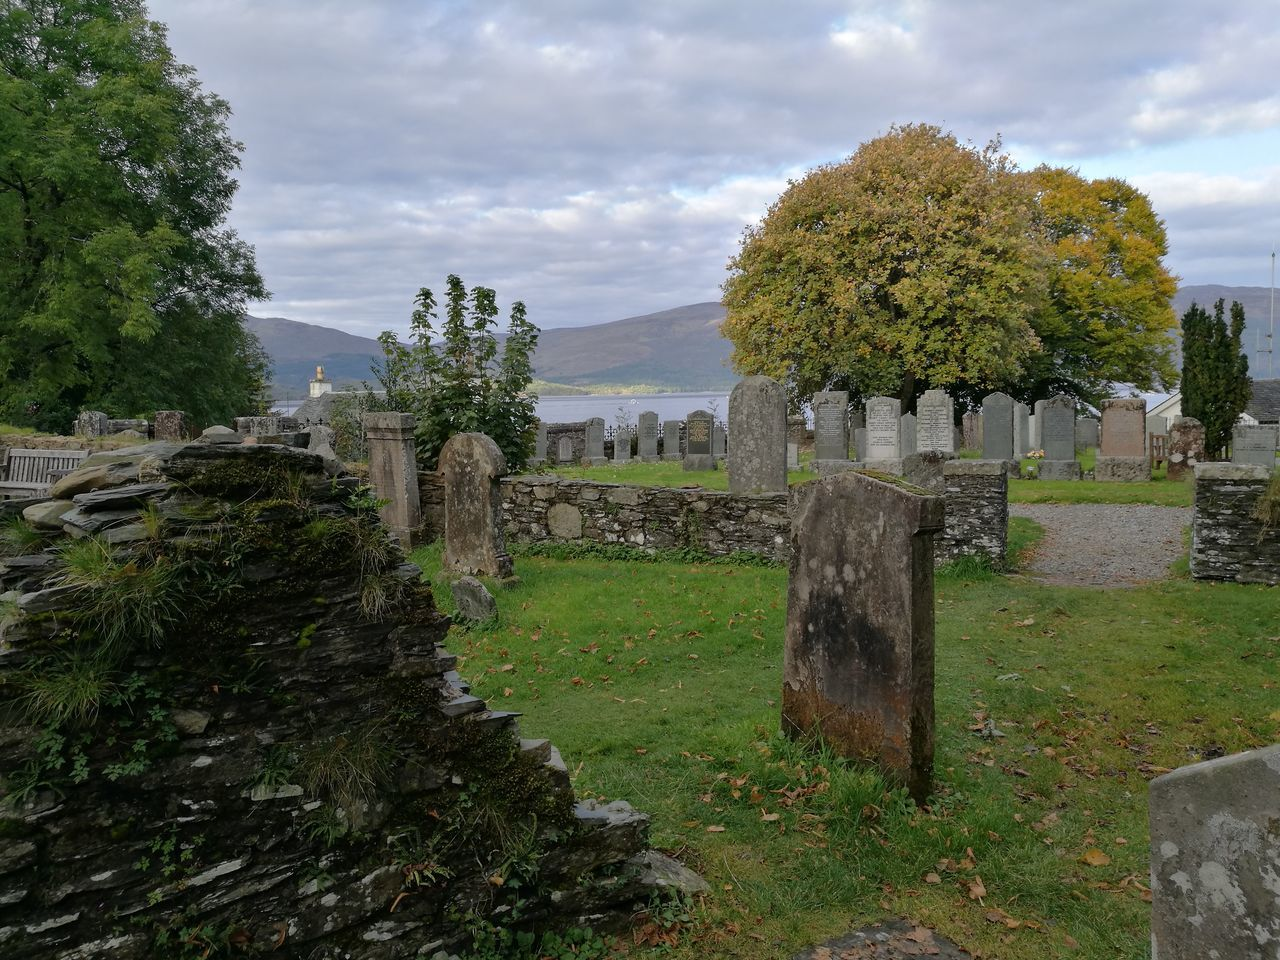 Picked my burial site. Graveyard Beauty Tombstone LochLomond Scotland Scotland 💕